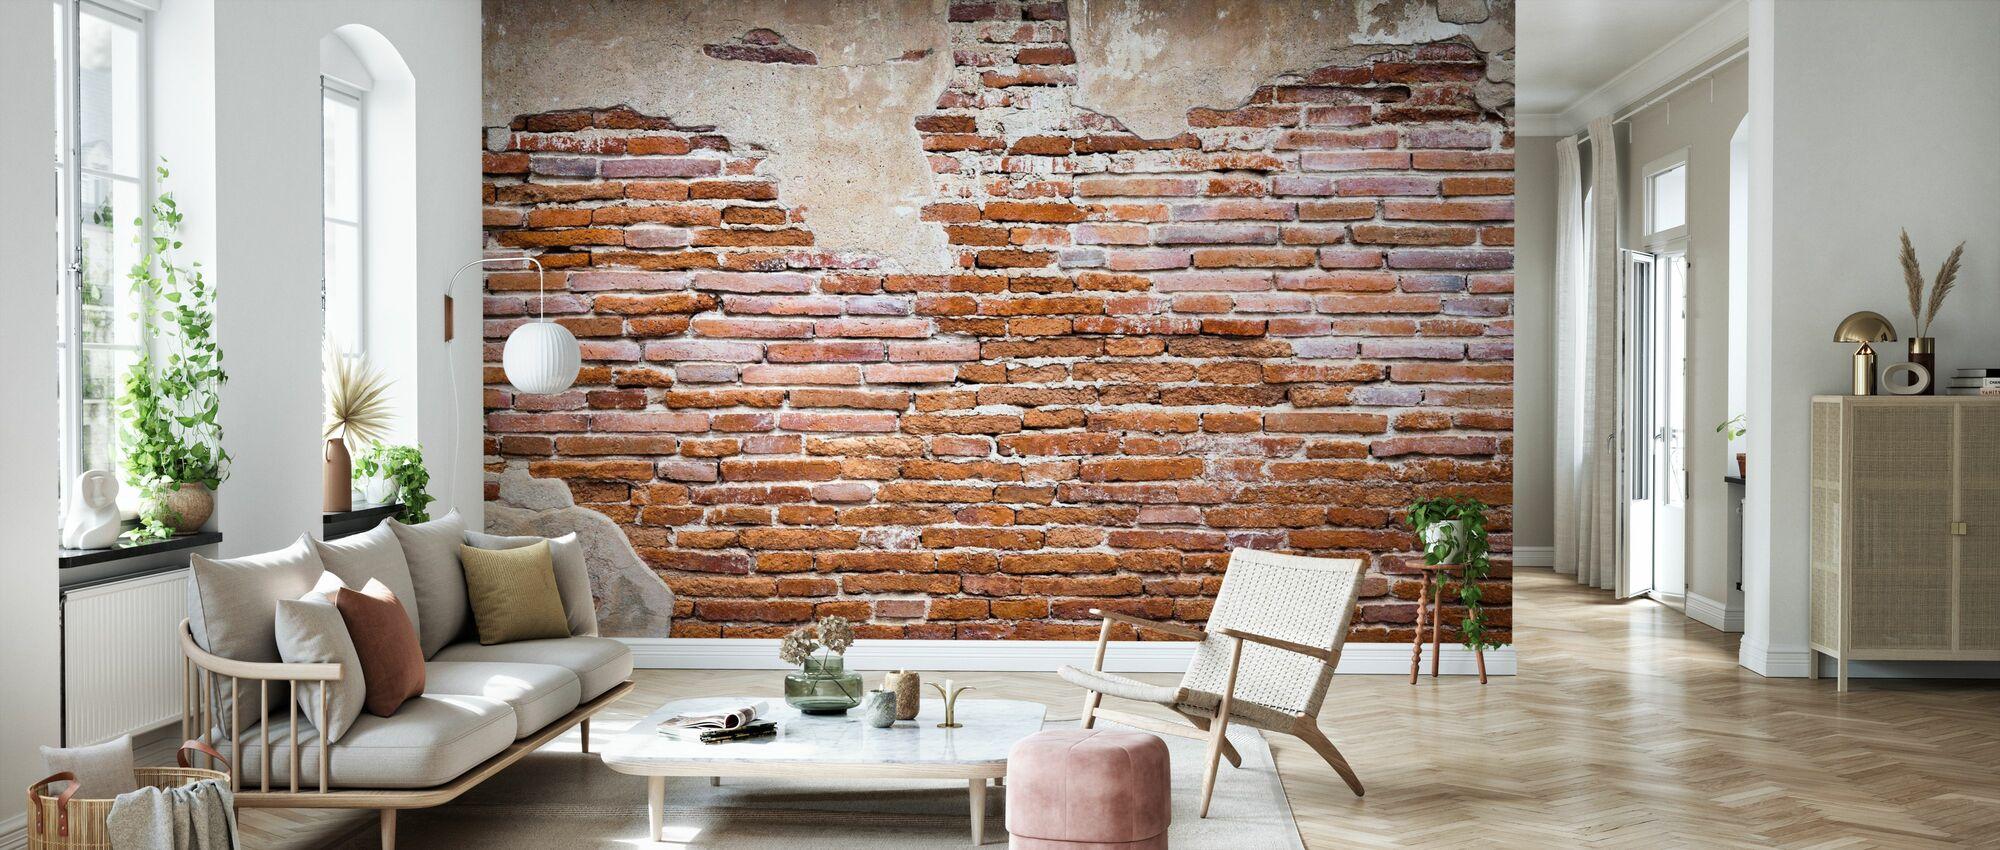 Fragment of Brick Wall - Wallpaper - Living Room